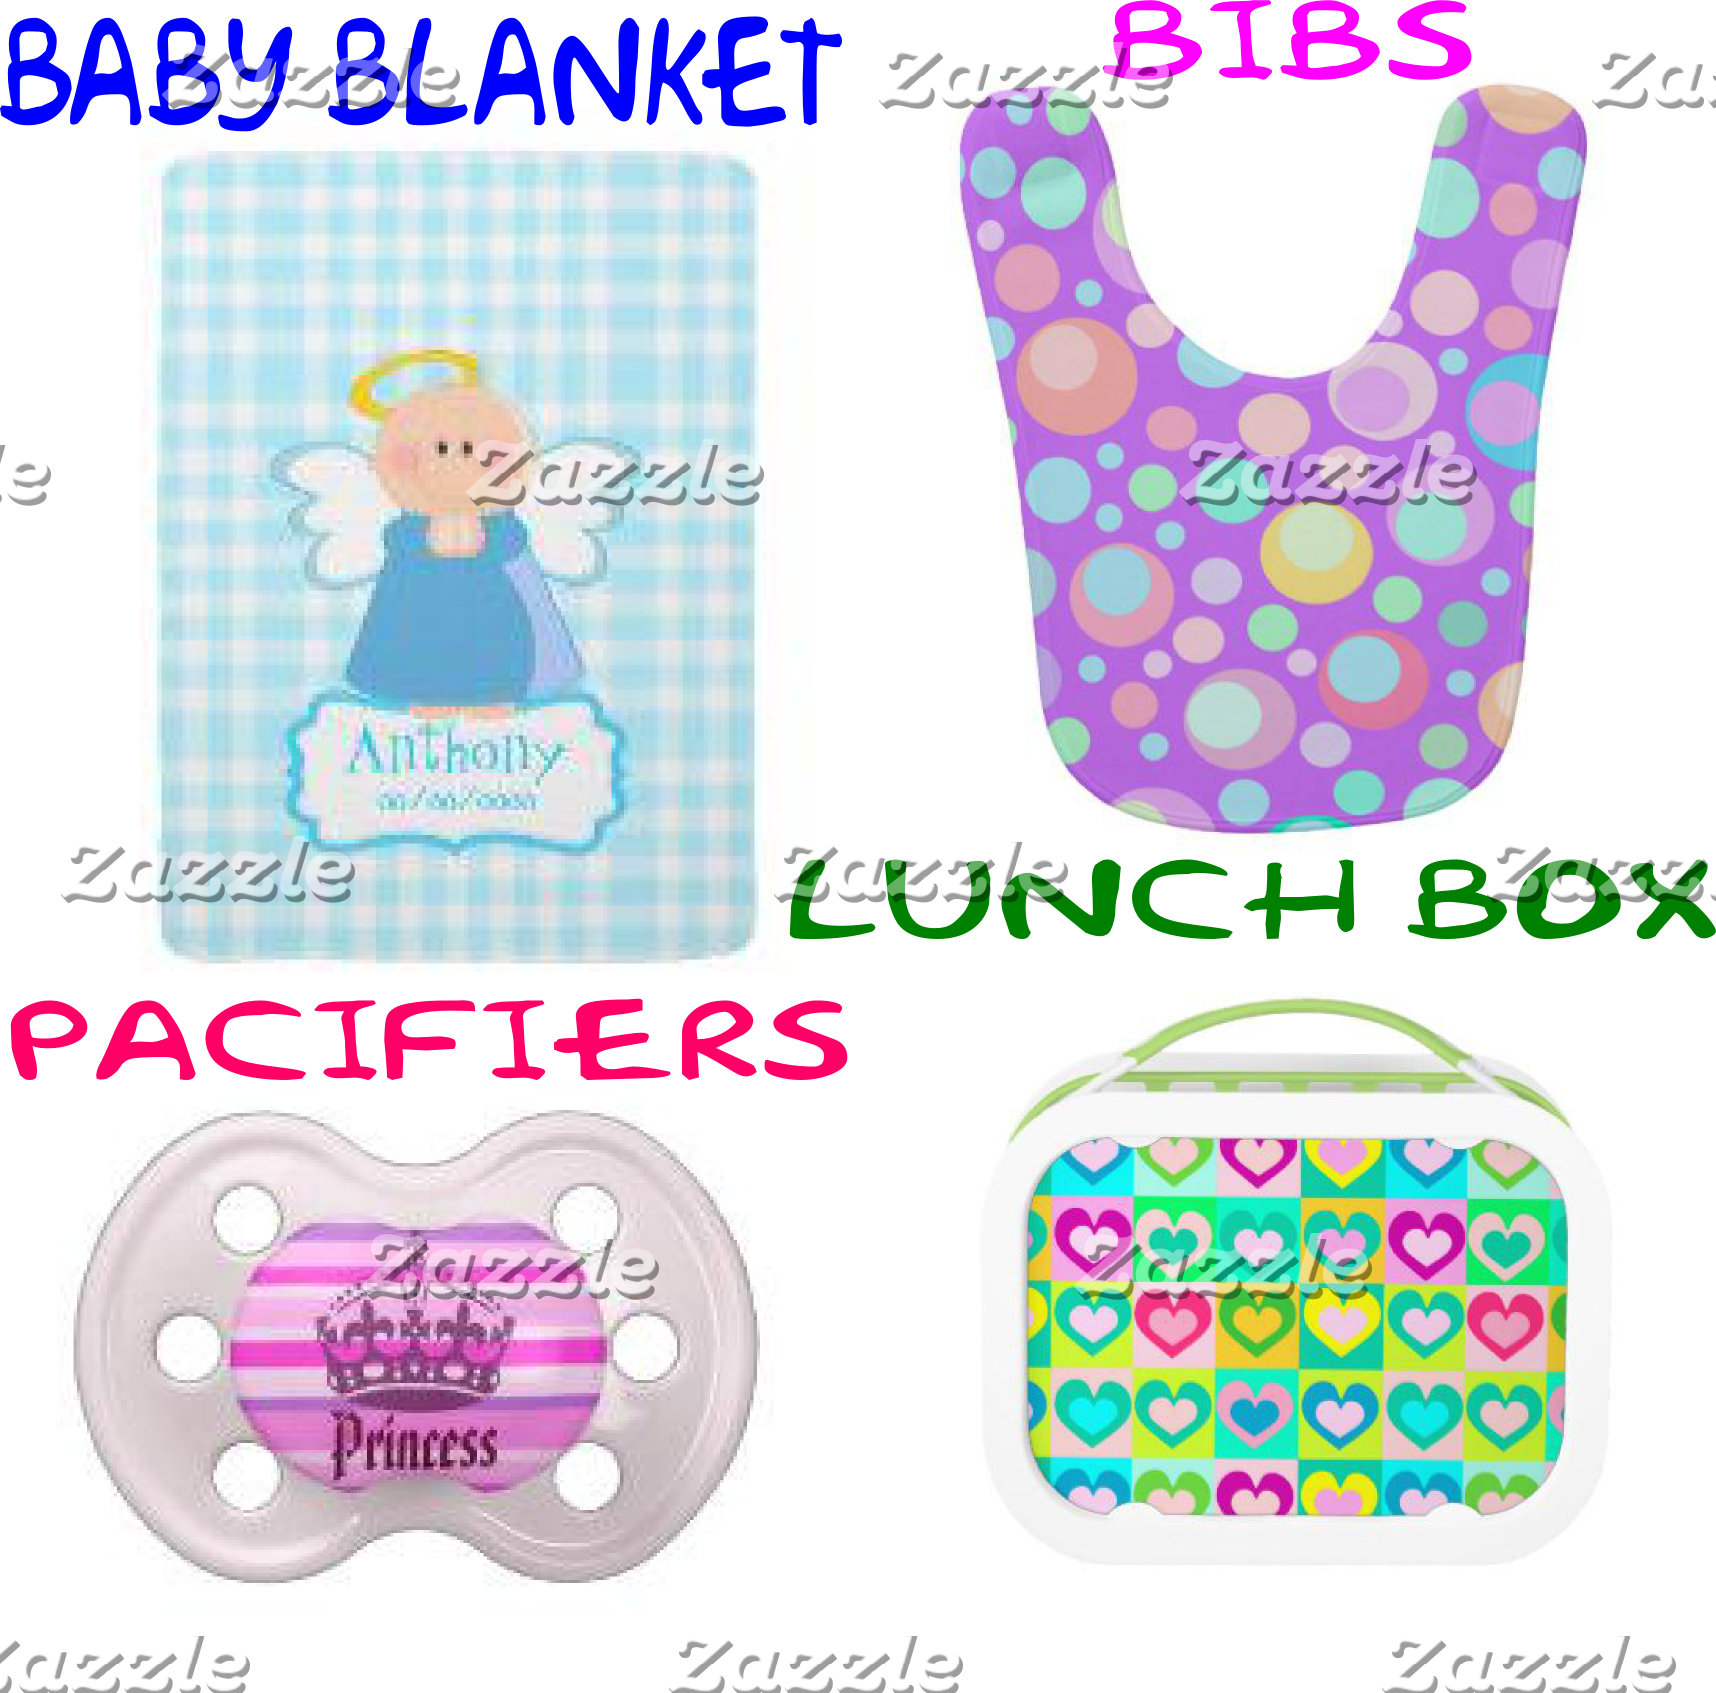 PACIFIER-LUNCHBOX-BIB-BLANKET-BABY BEANIE